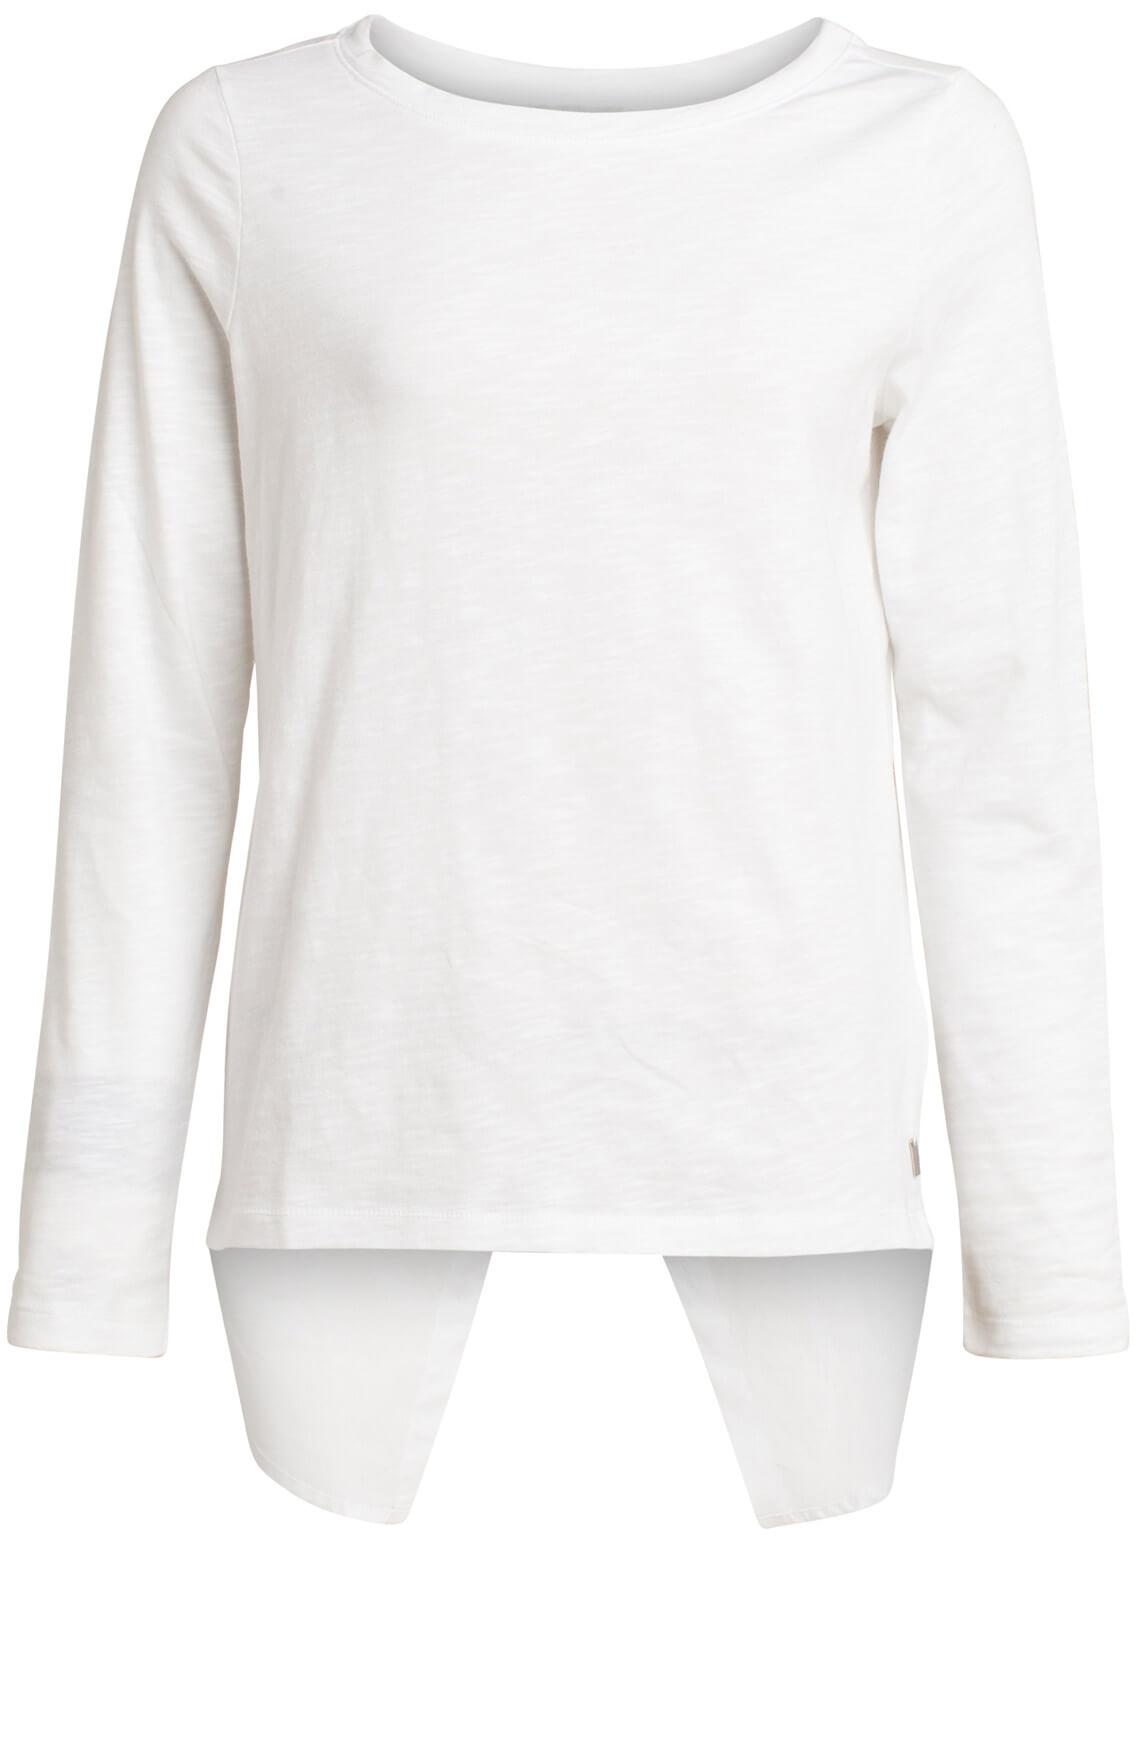 Anna Dames Shirt met blousedetail